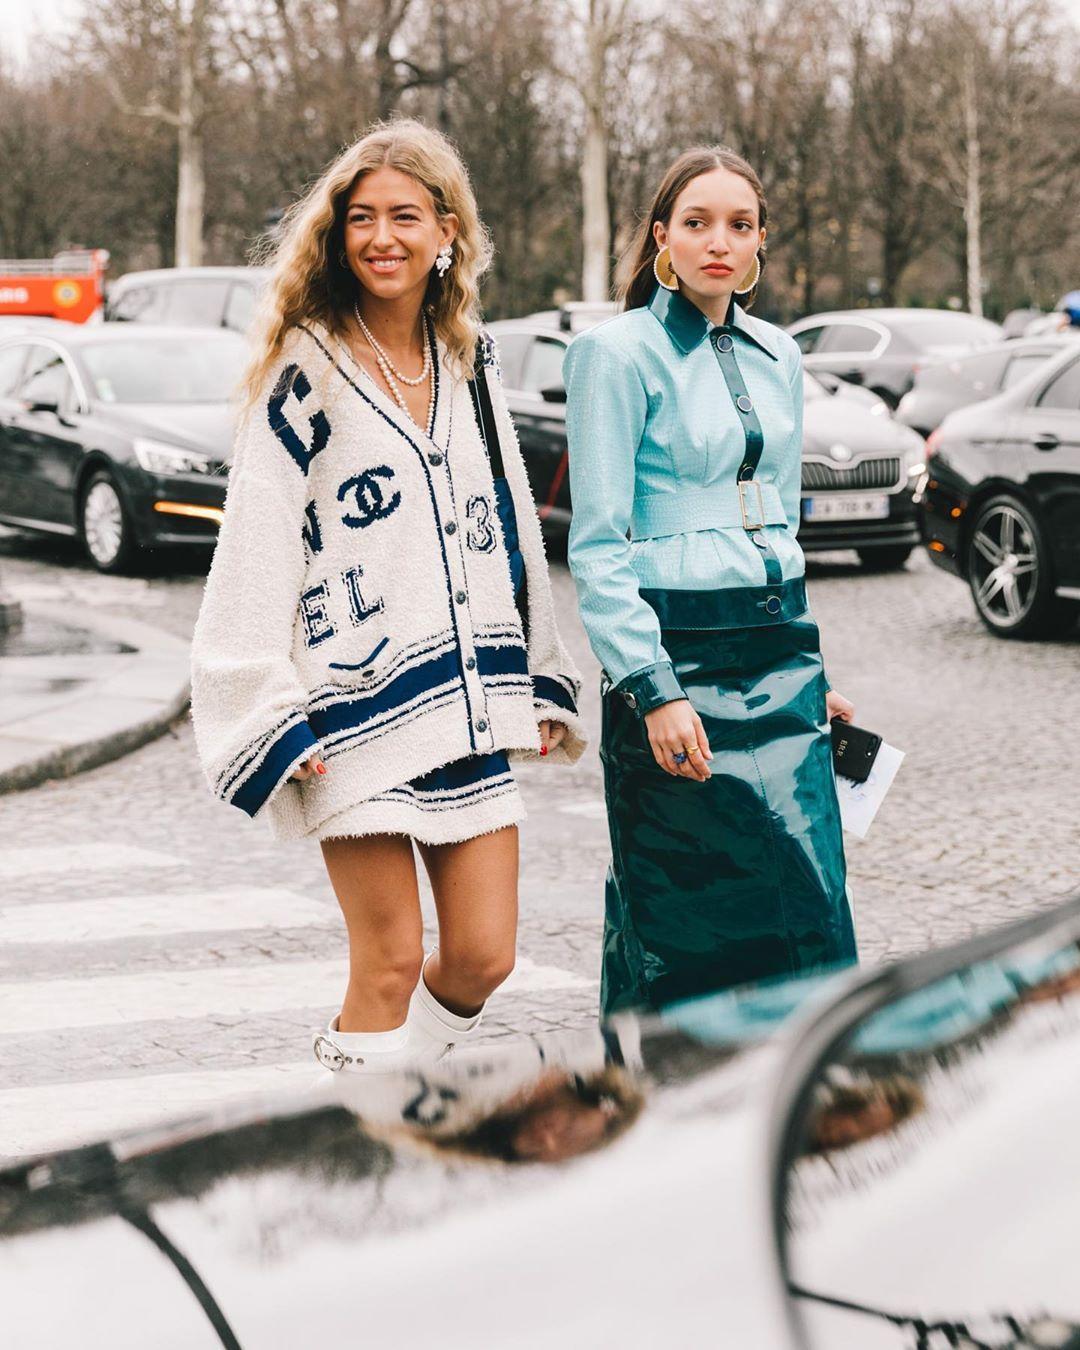 "Stylesight Spotlight® on Instagram: ""#StreetStyle Highlights ""pfw2019"" — #Style by @emilisindlev w/ @chanelofficial look from #Paris Fashion Week: @parisfashionweek credit to…"""